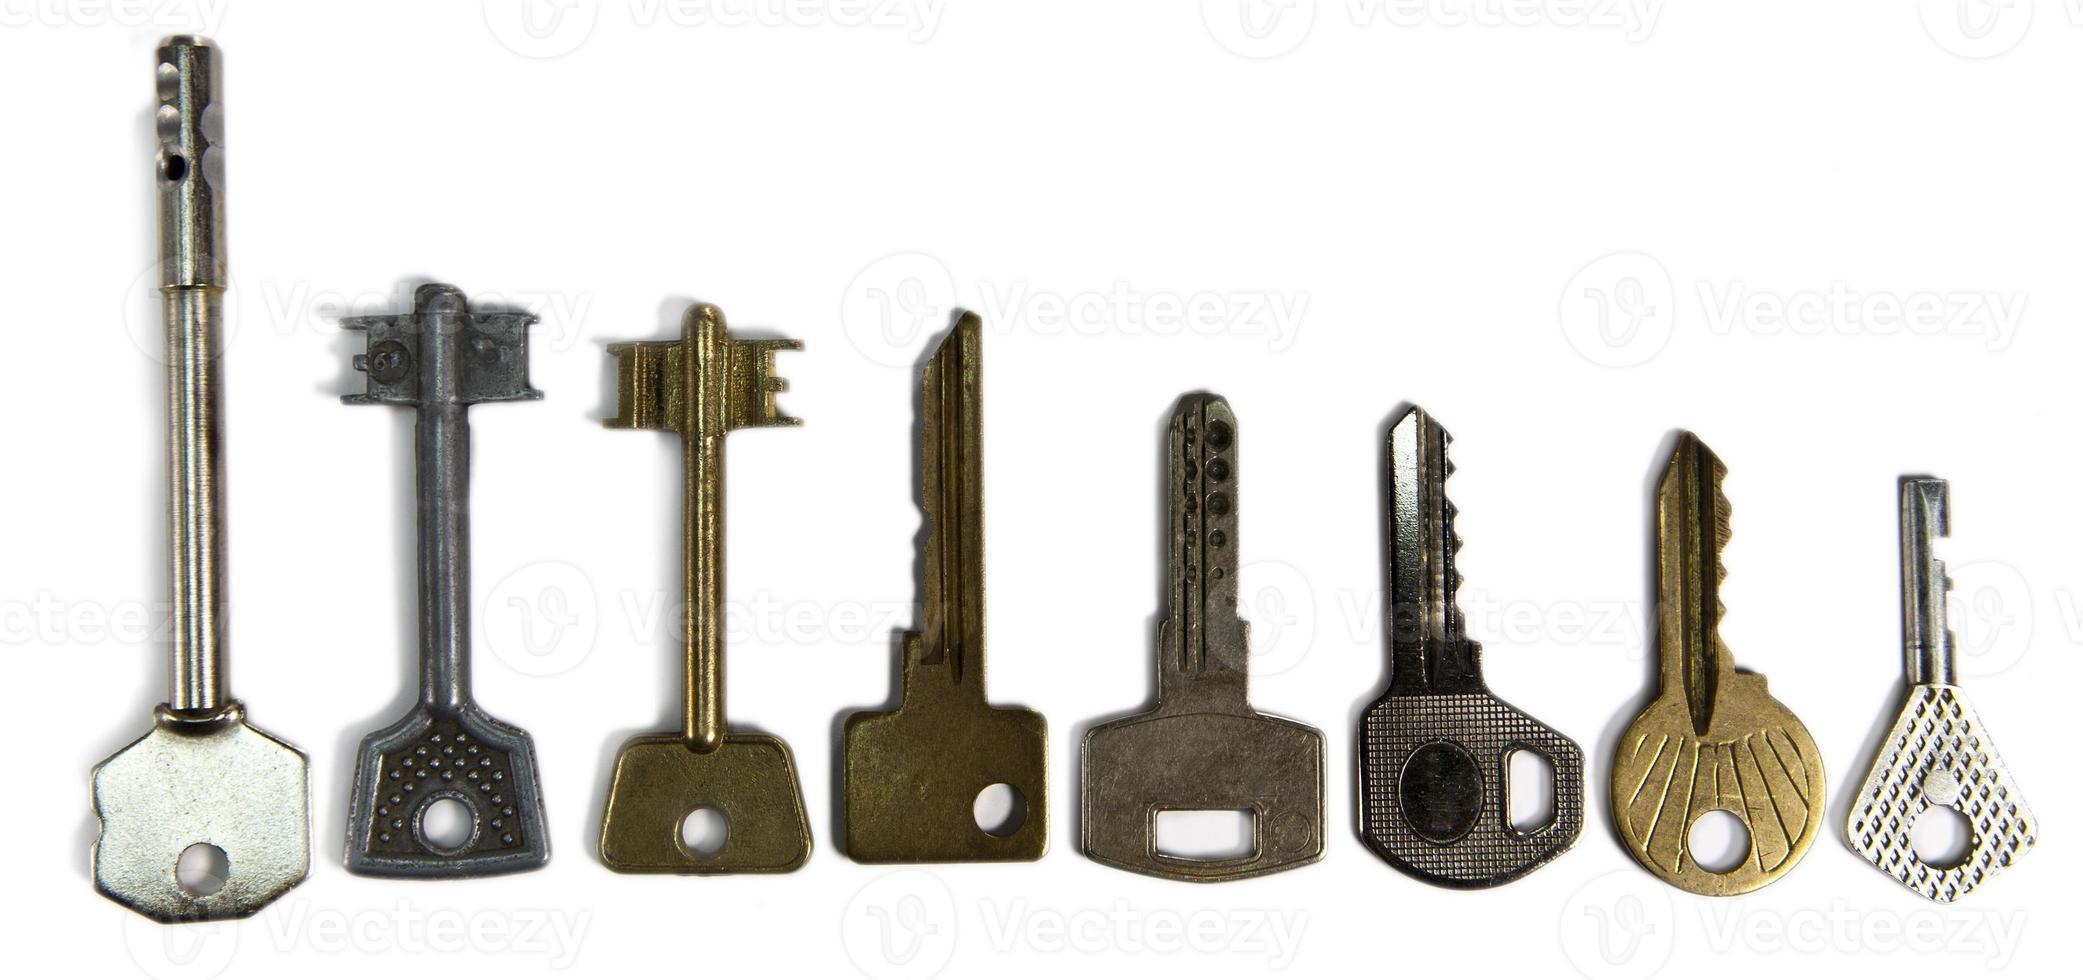 chiavi di varia forma, su uno sfondo bianco foto